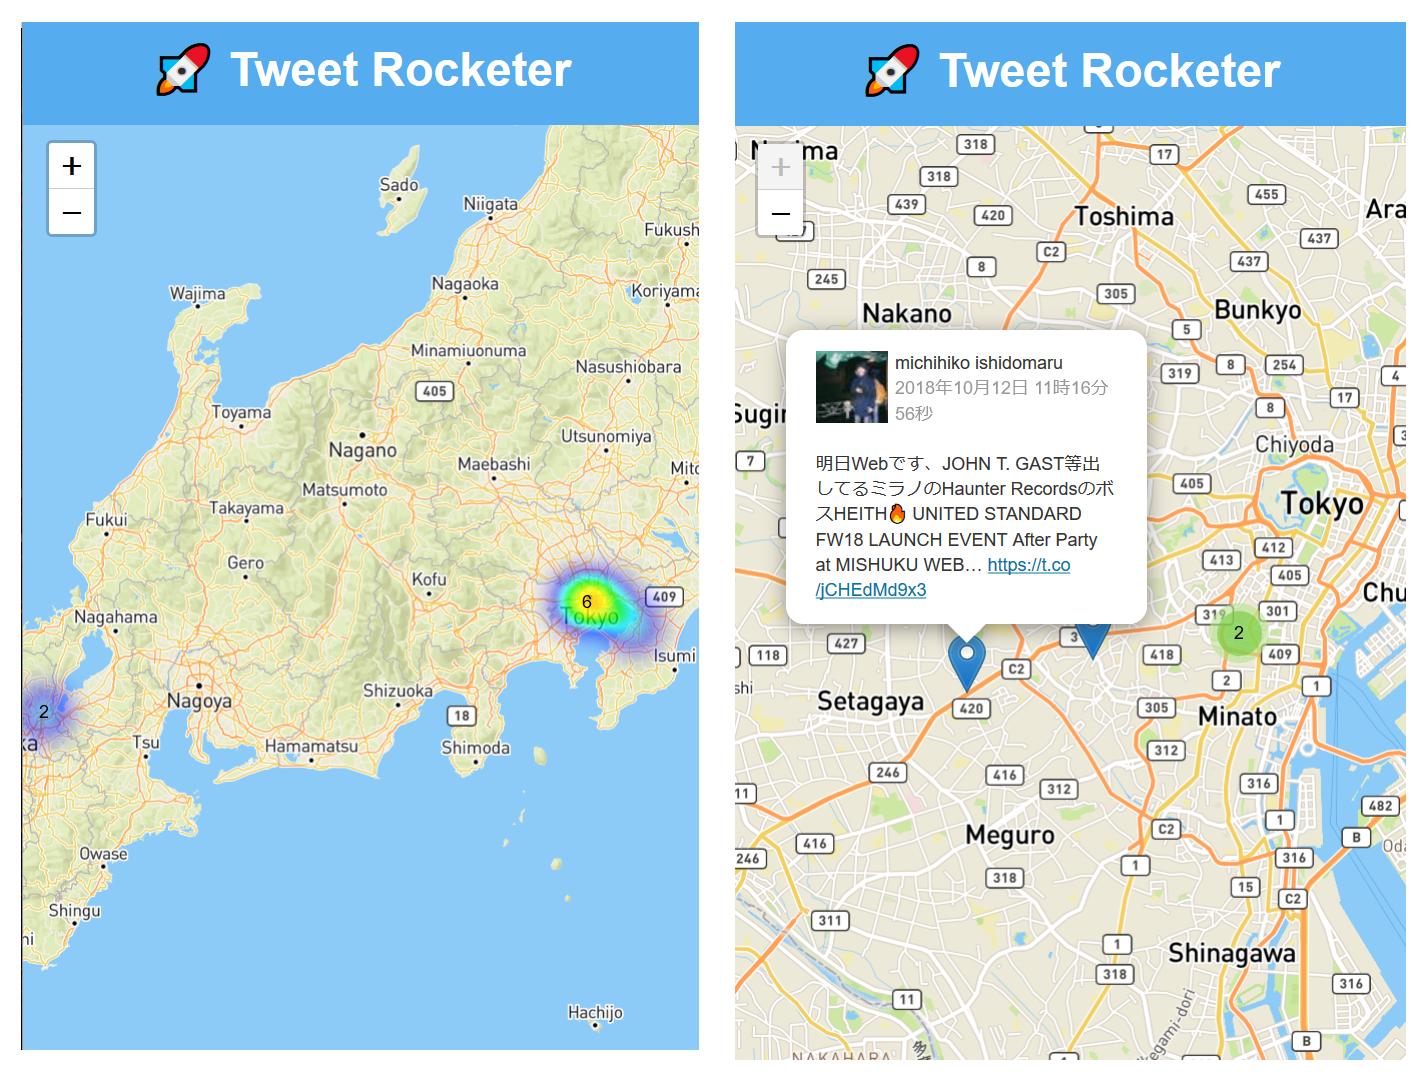 tweet_rocketer.png